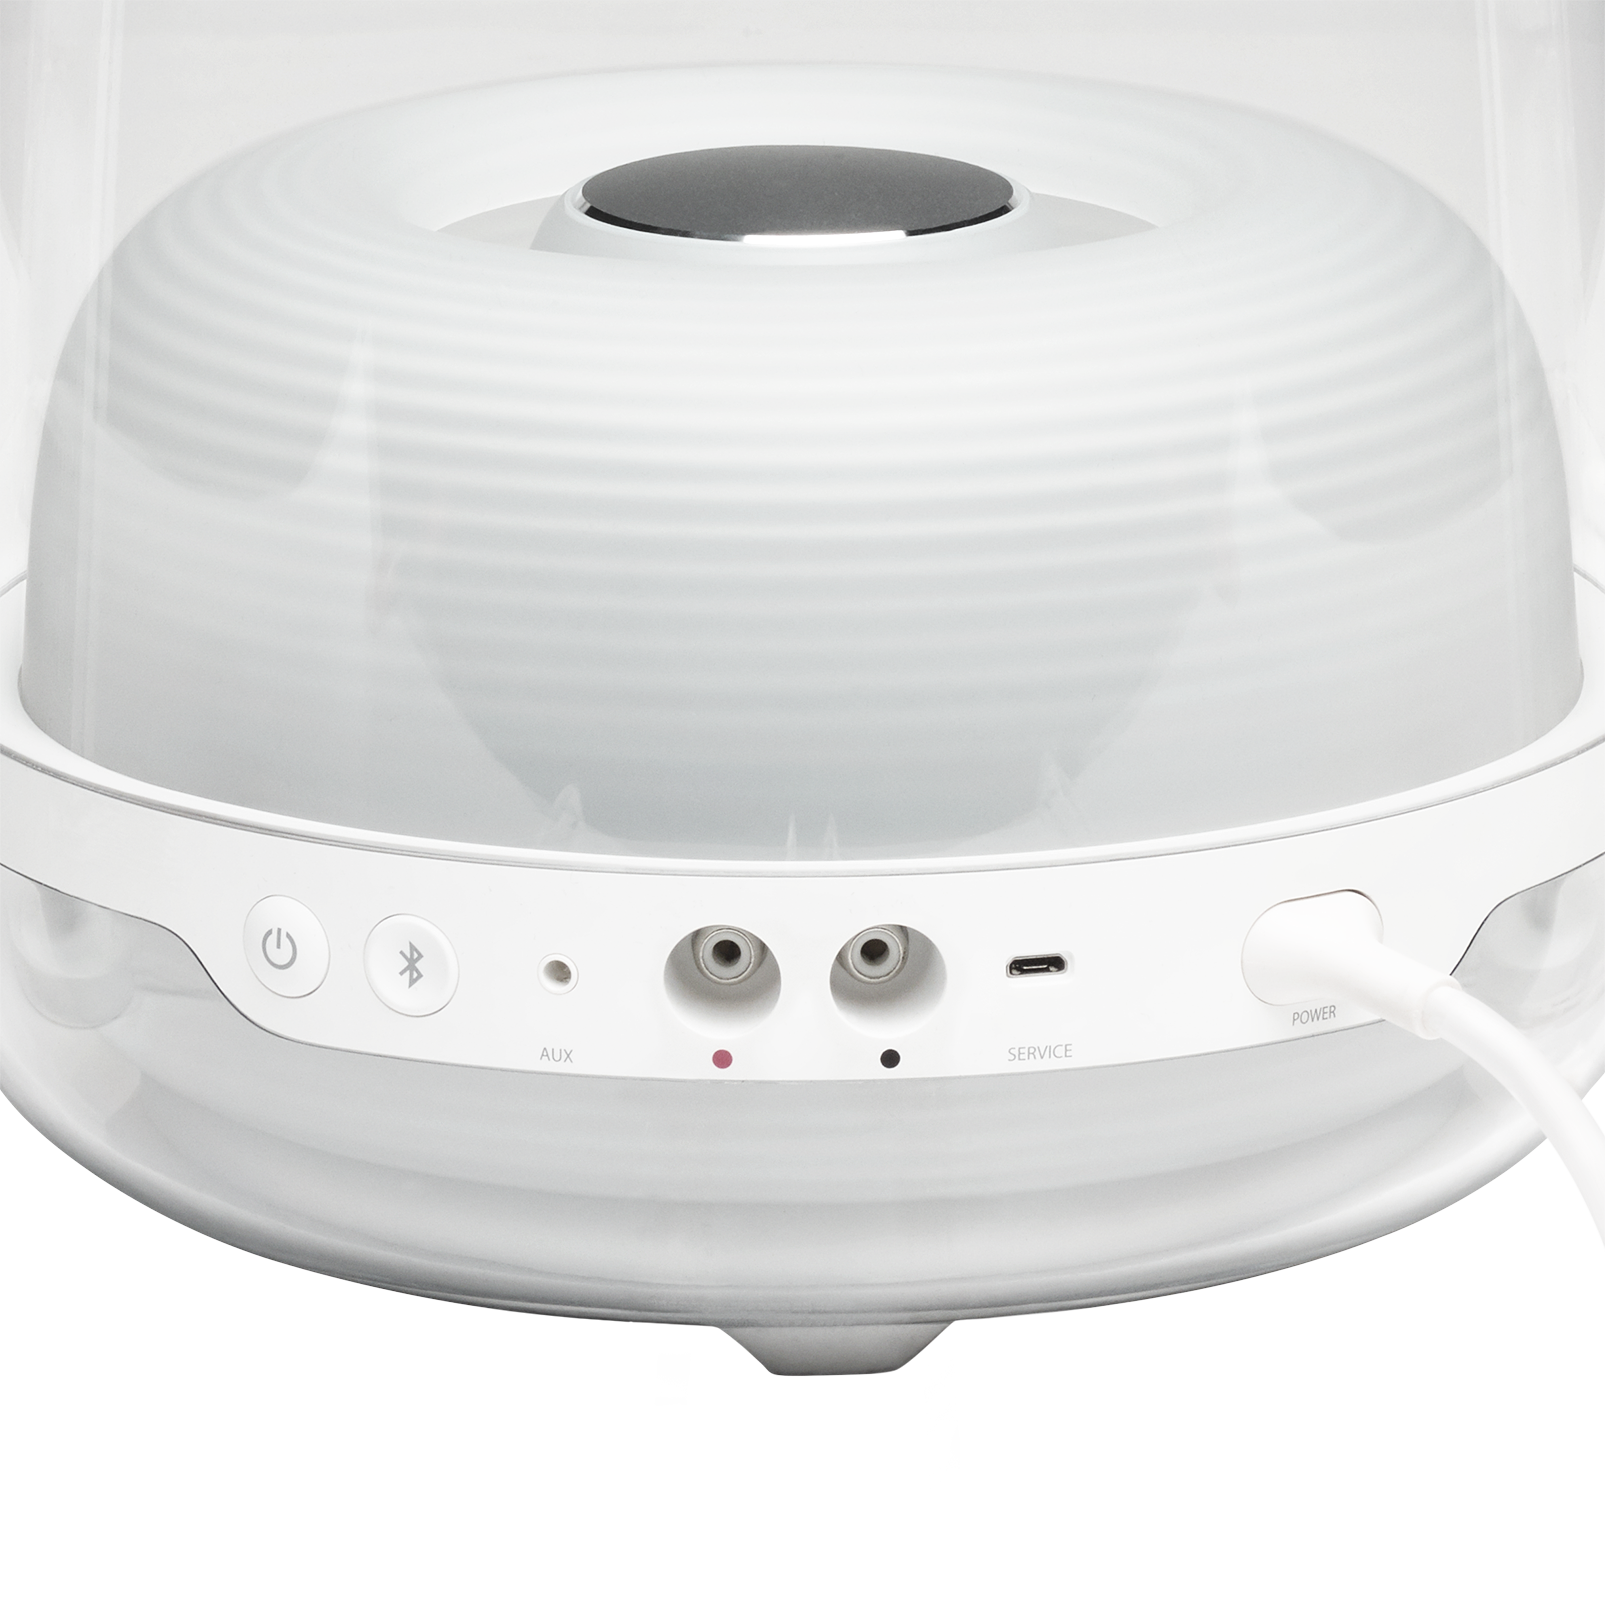 Harman Kardon SoundSticks 4 - White - Bluetooth Speaker System - Detailshot 1